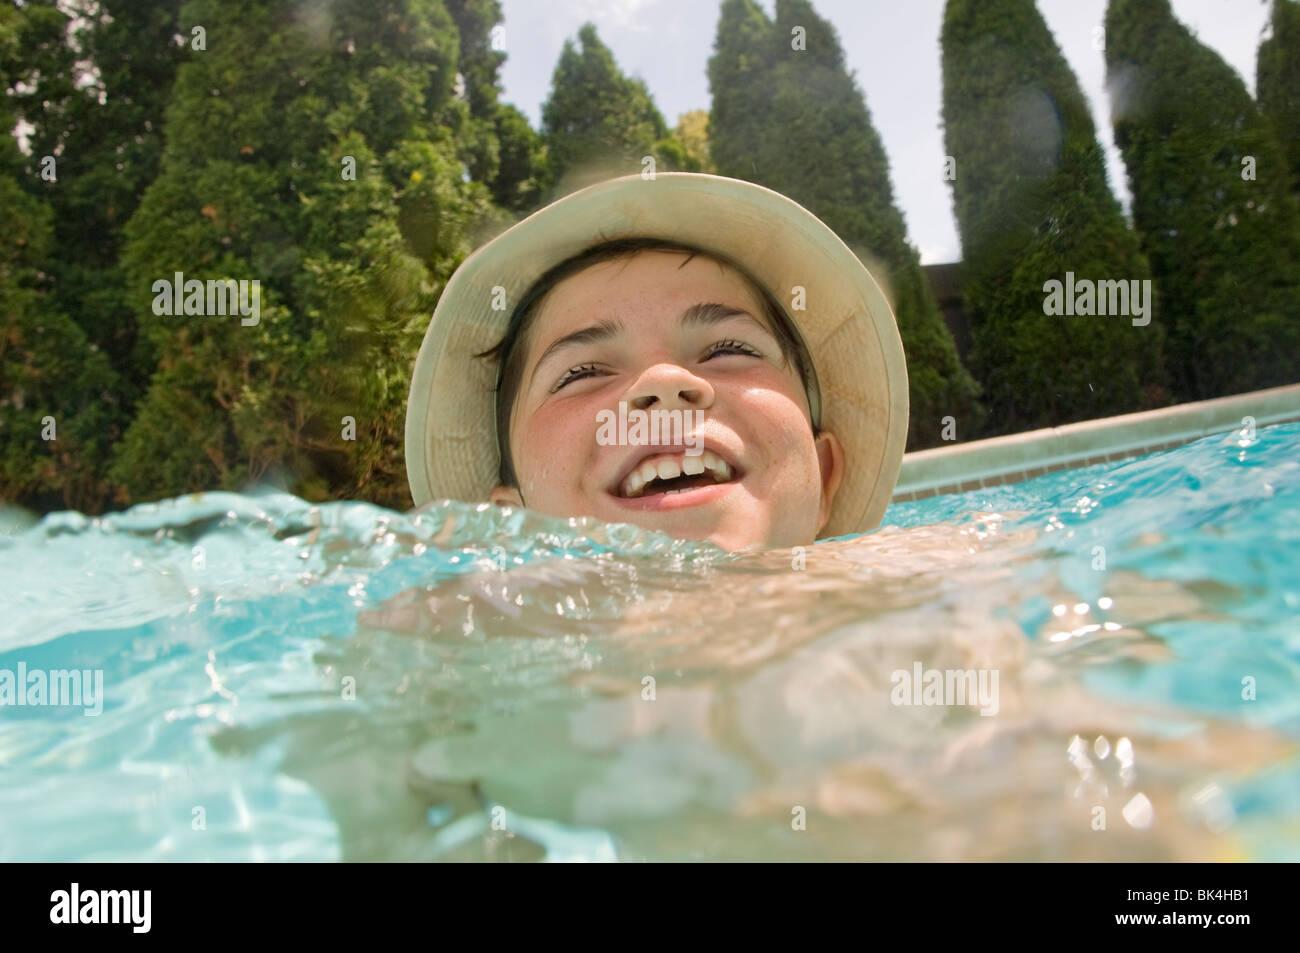 Boy wearing hat in swimming pool Photo Stock